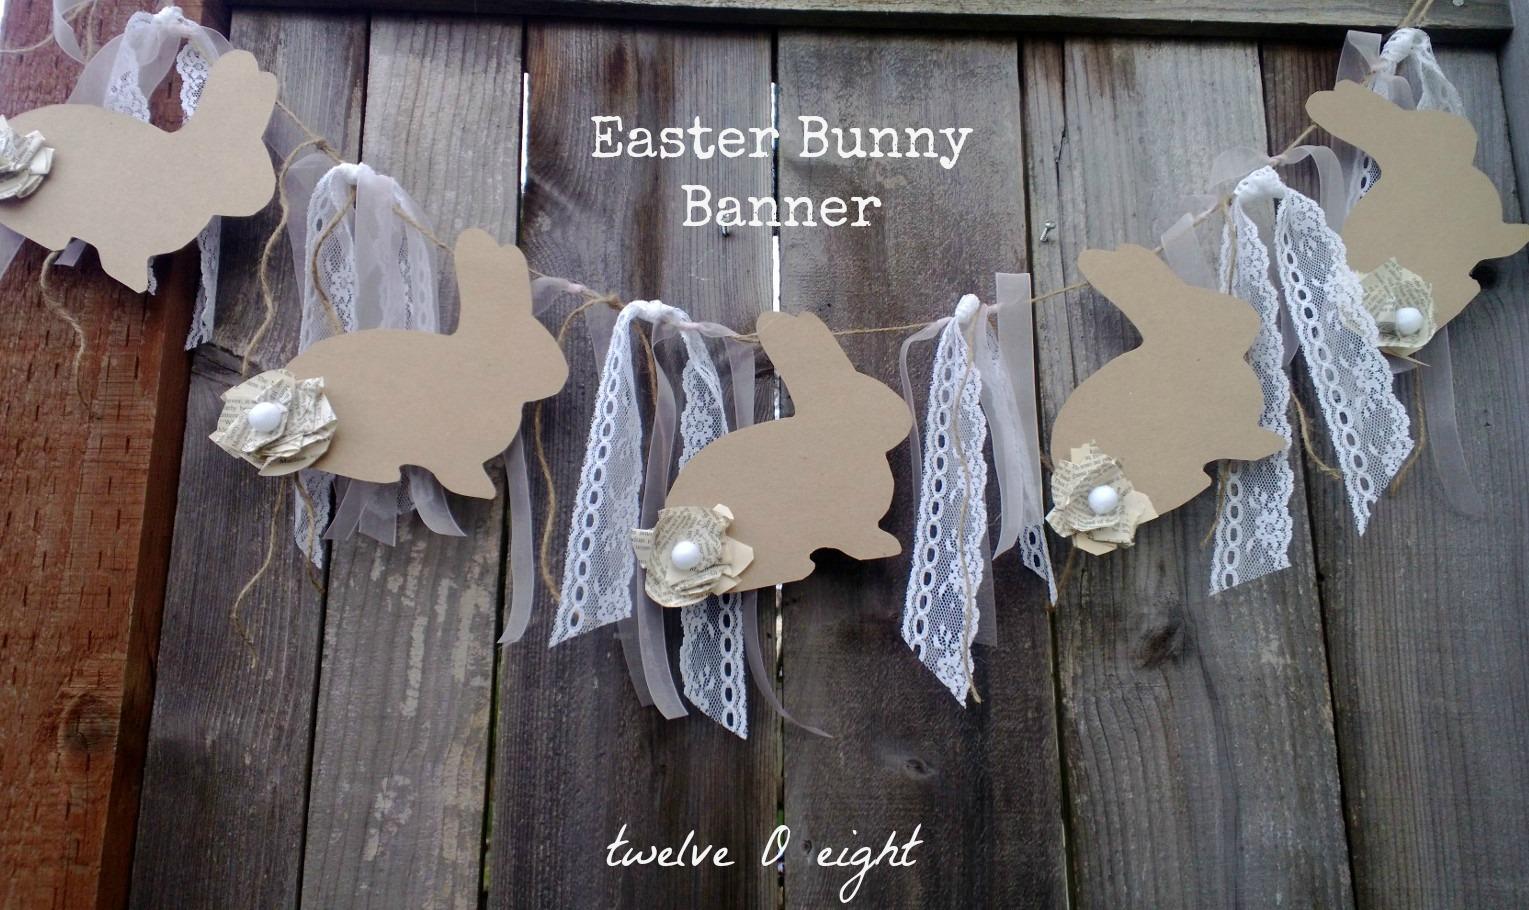 Banner: Easter Bunny Banner